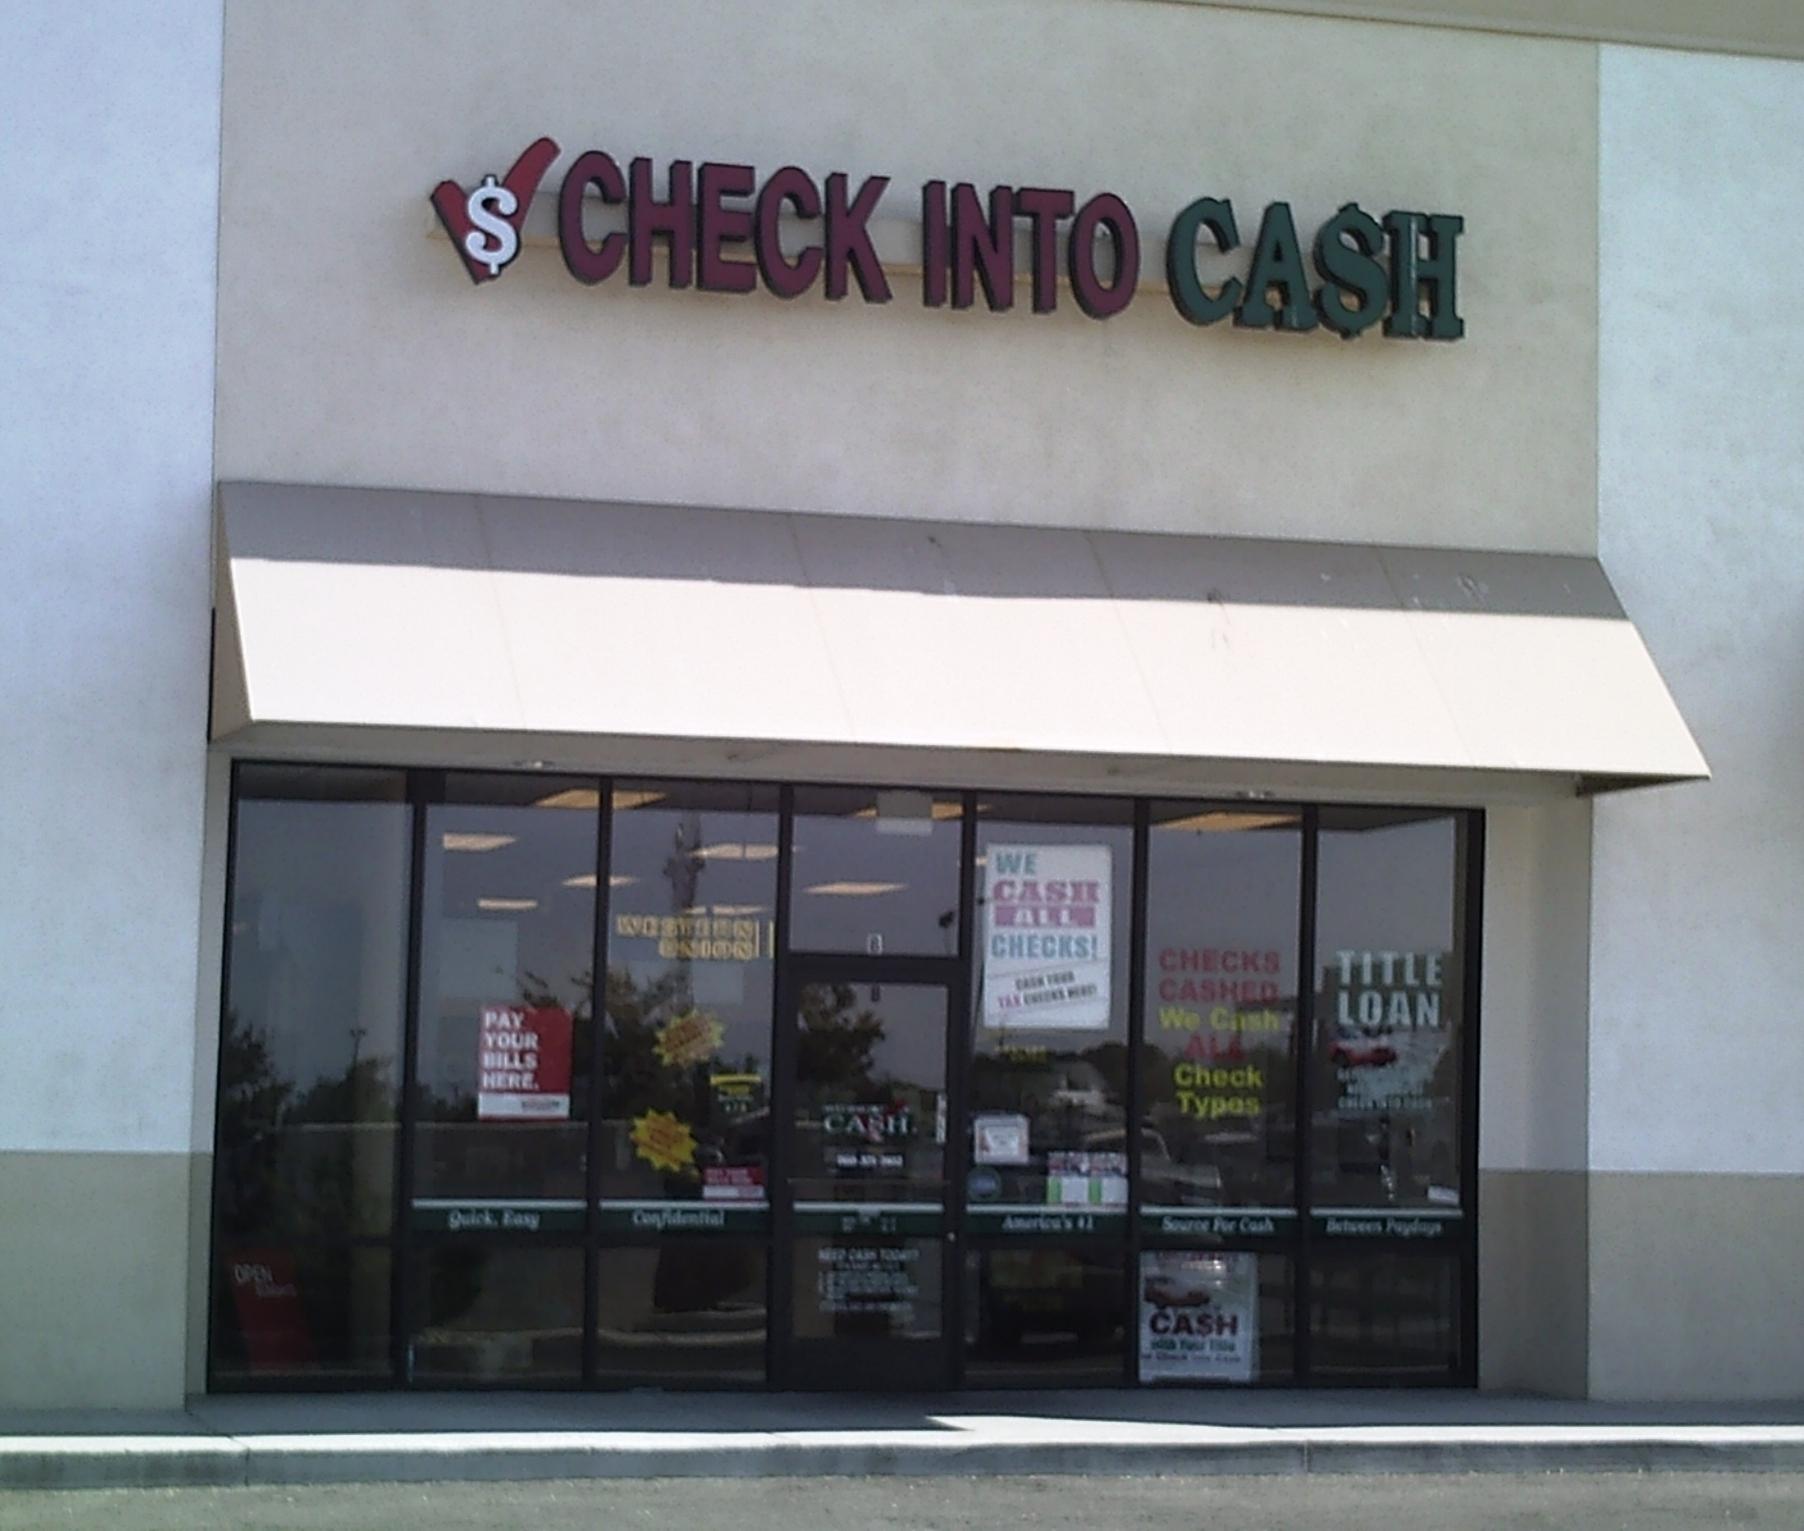 Personal cash loans to your door photo 9